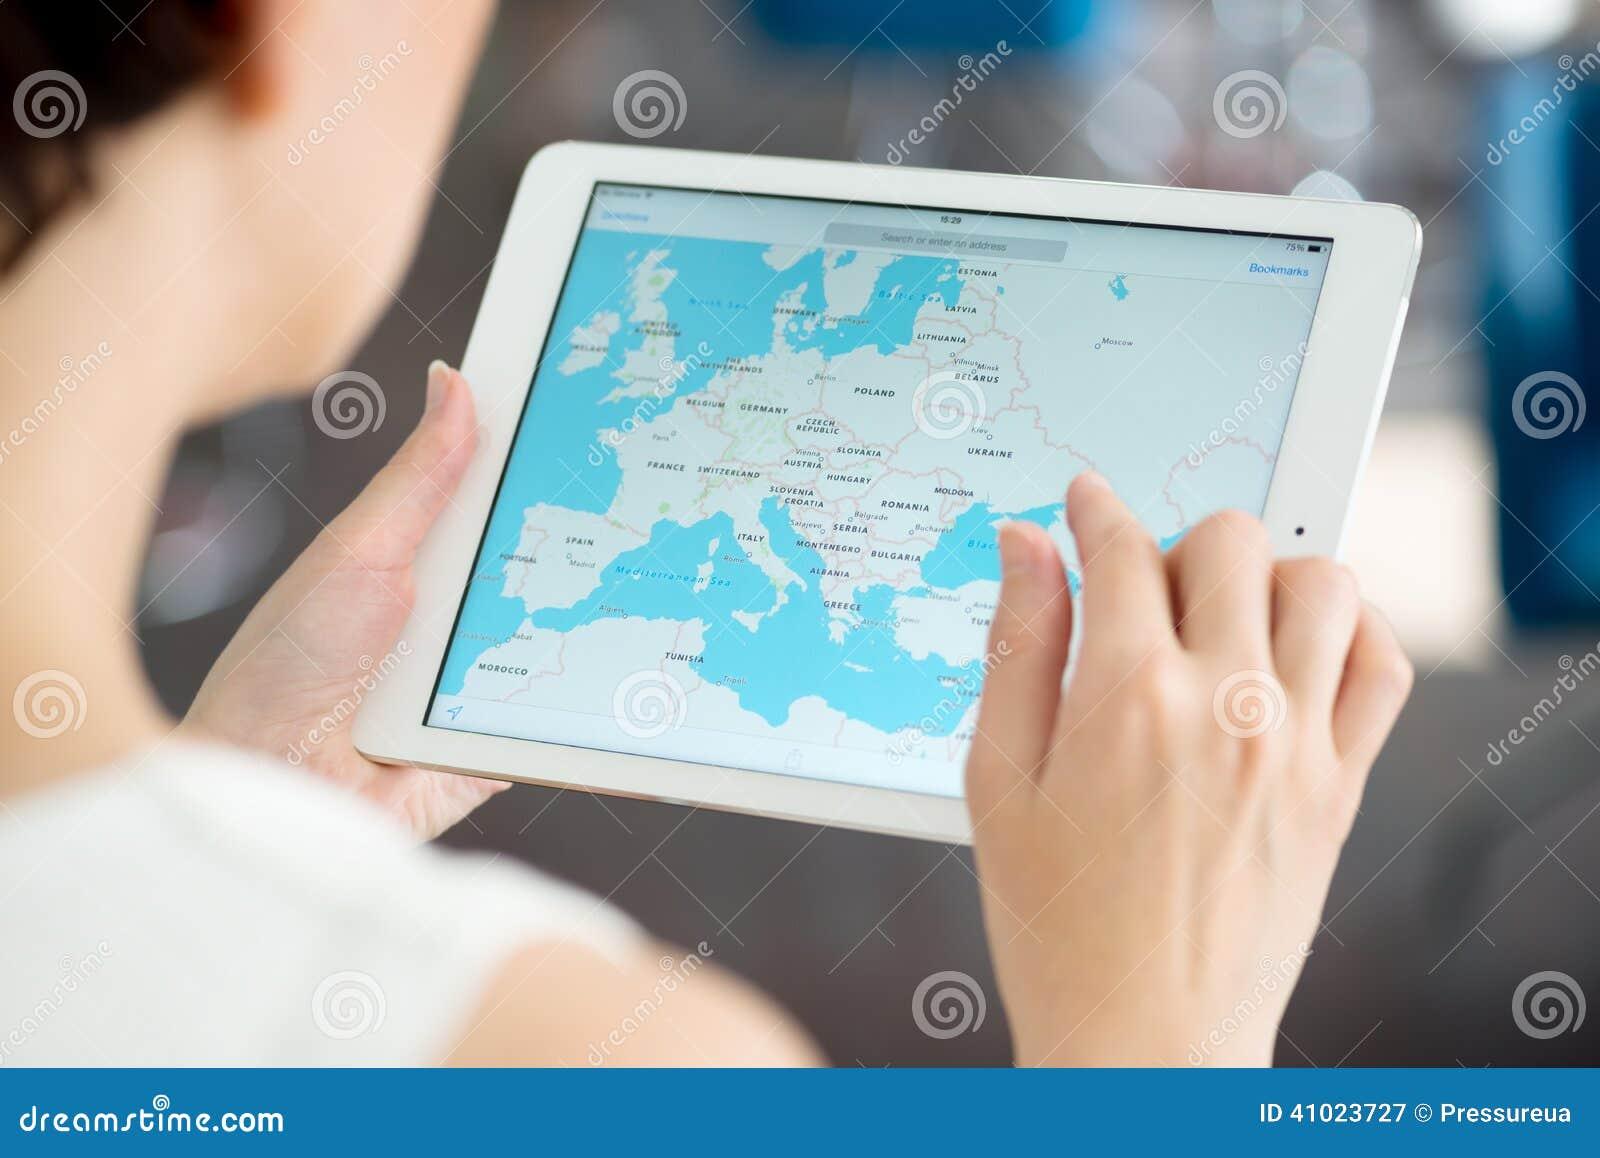 Google Maps στον αέρα της Apple iPad